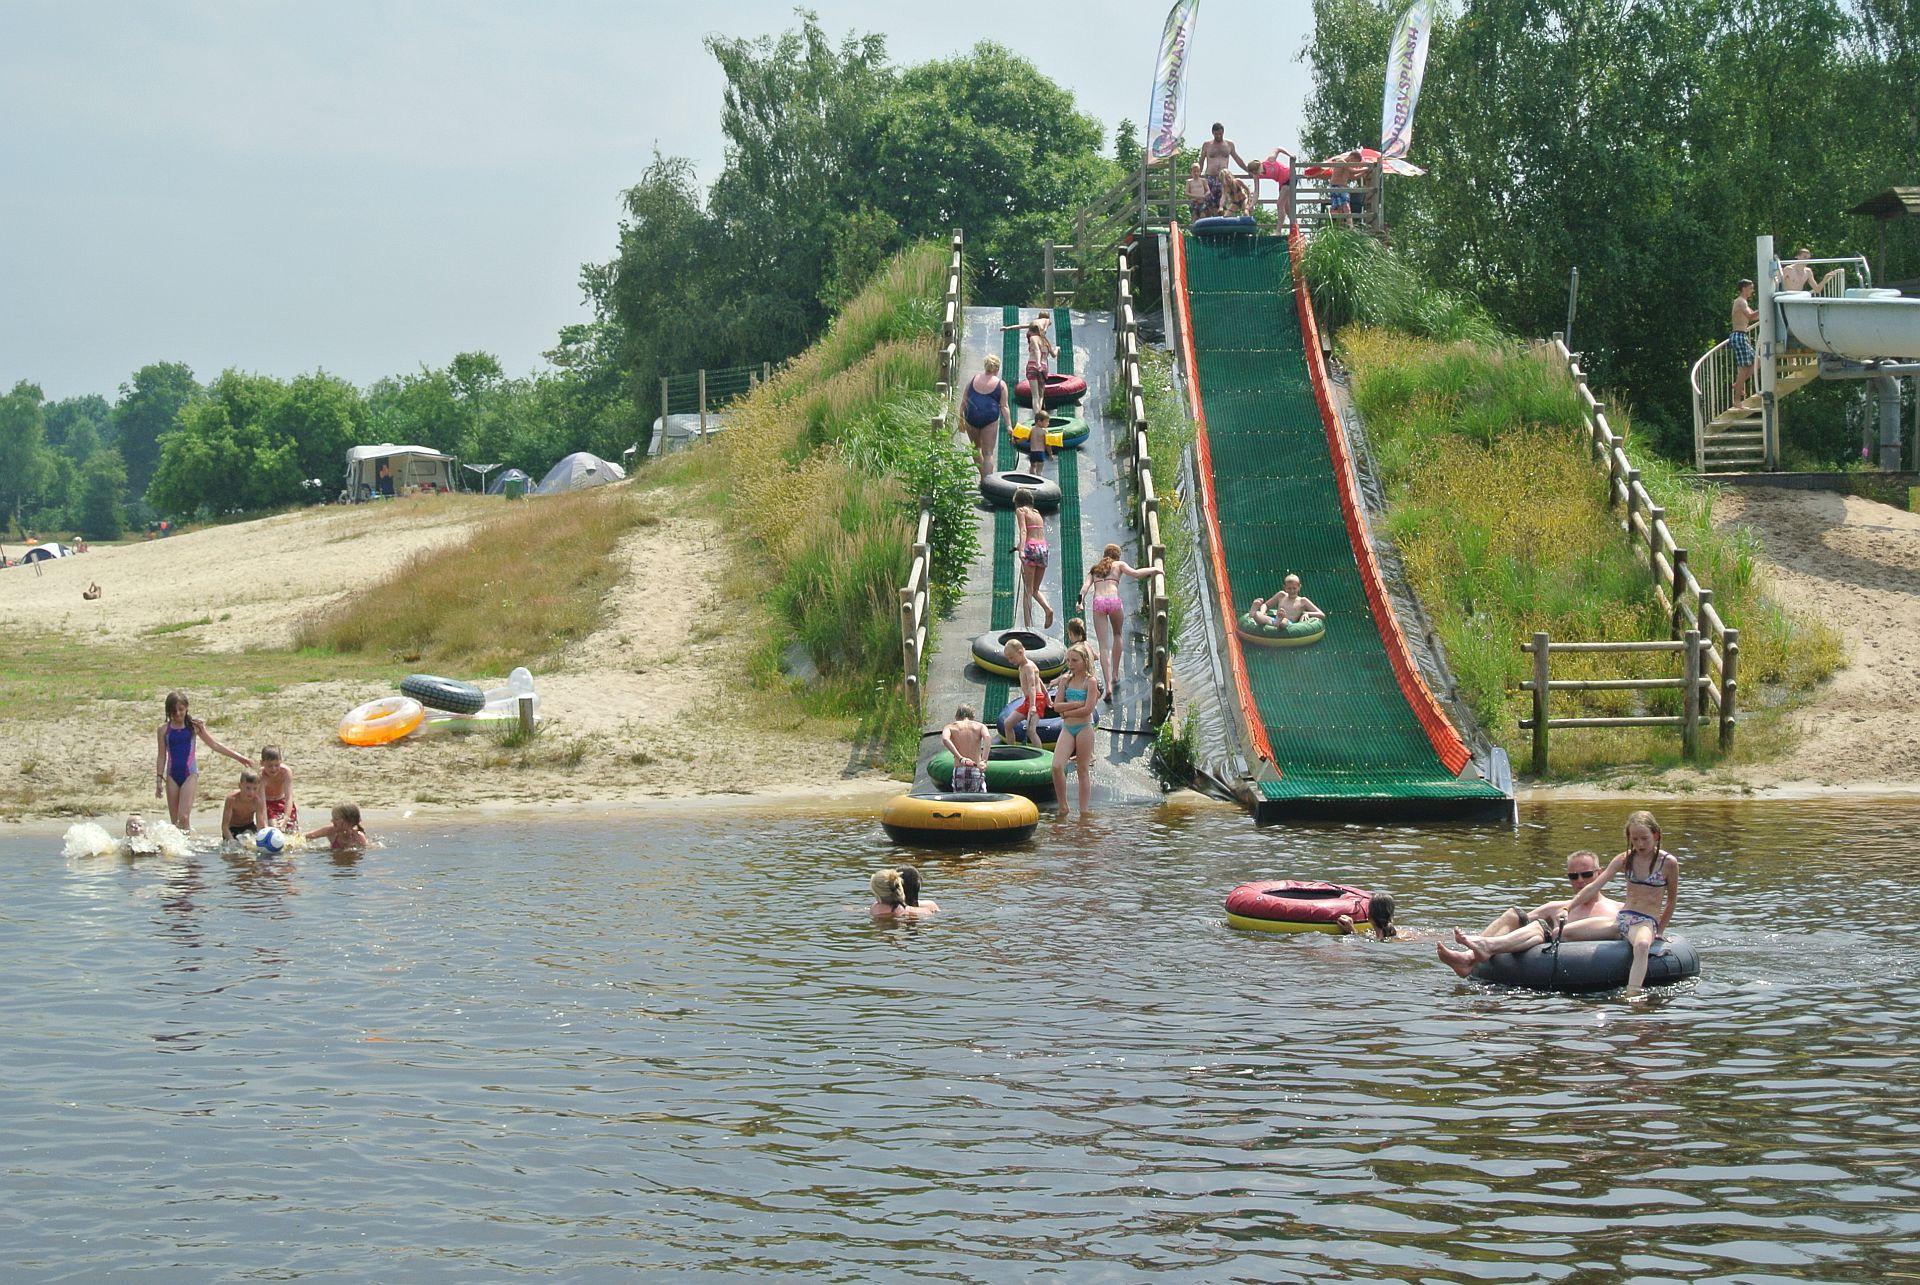 ANWB top camping met 5 sterren in Overijssel - ANWB top camping